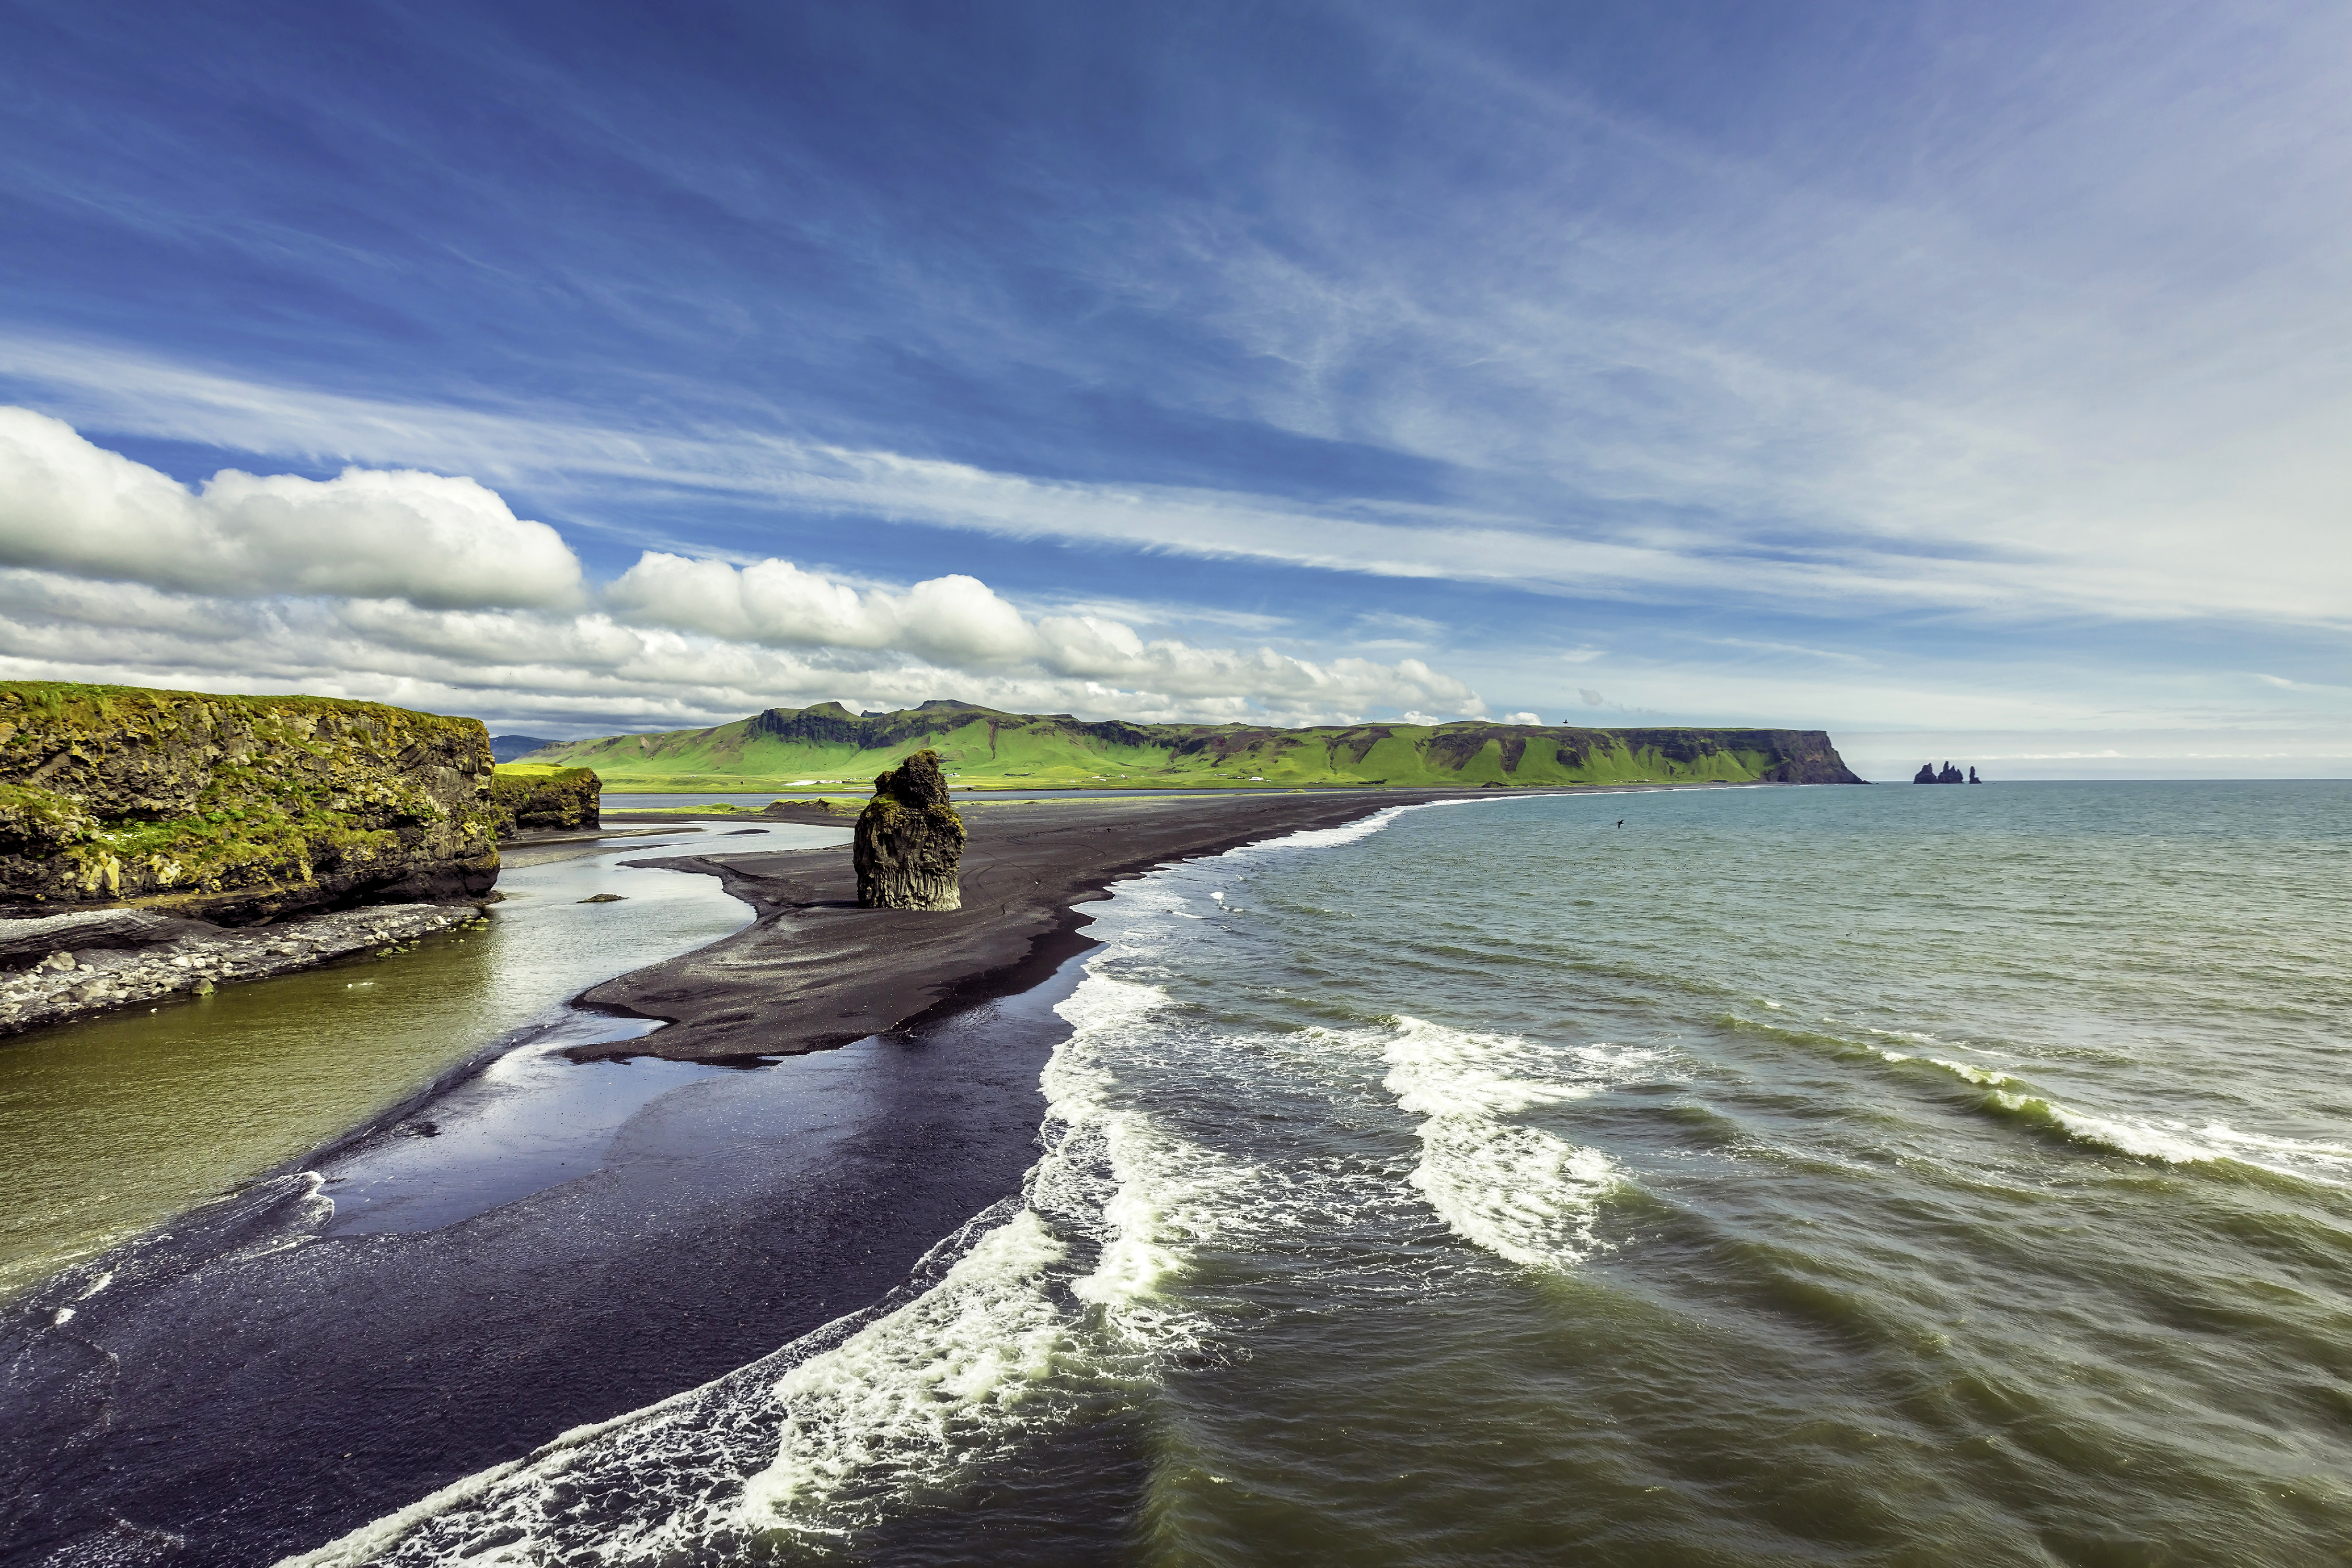 Iceland-Dyrholaey-black-sand-beach-Icelandic.JPG?mtime=20160627082235#asset:42792